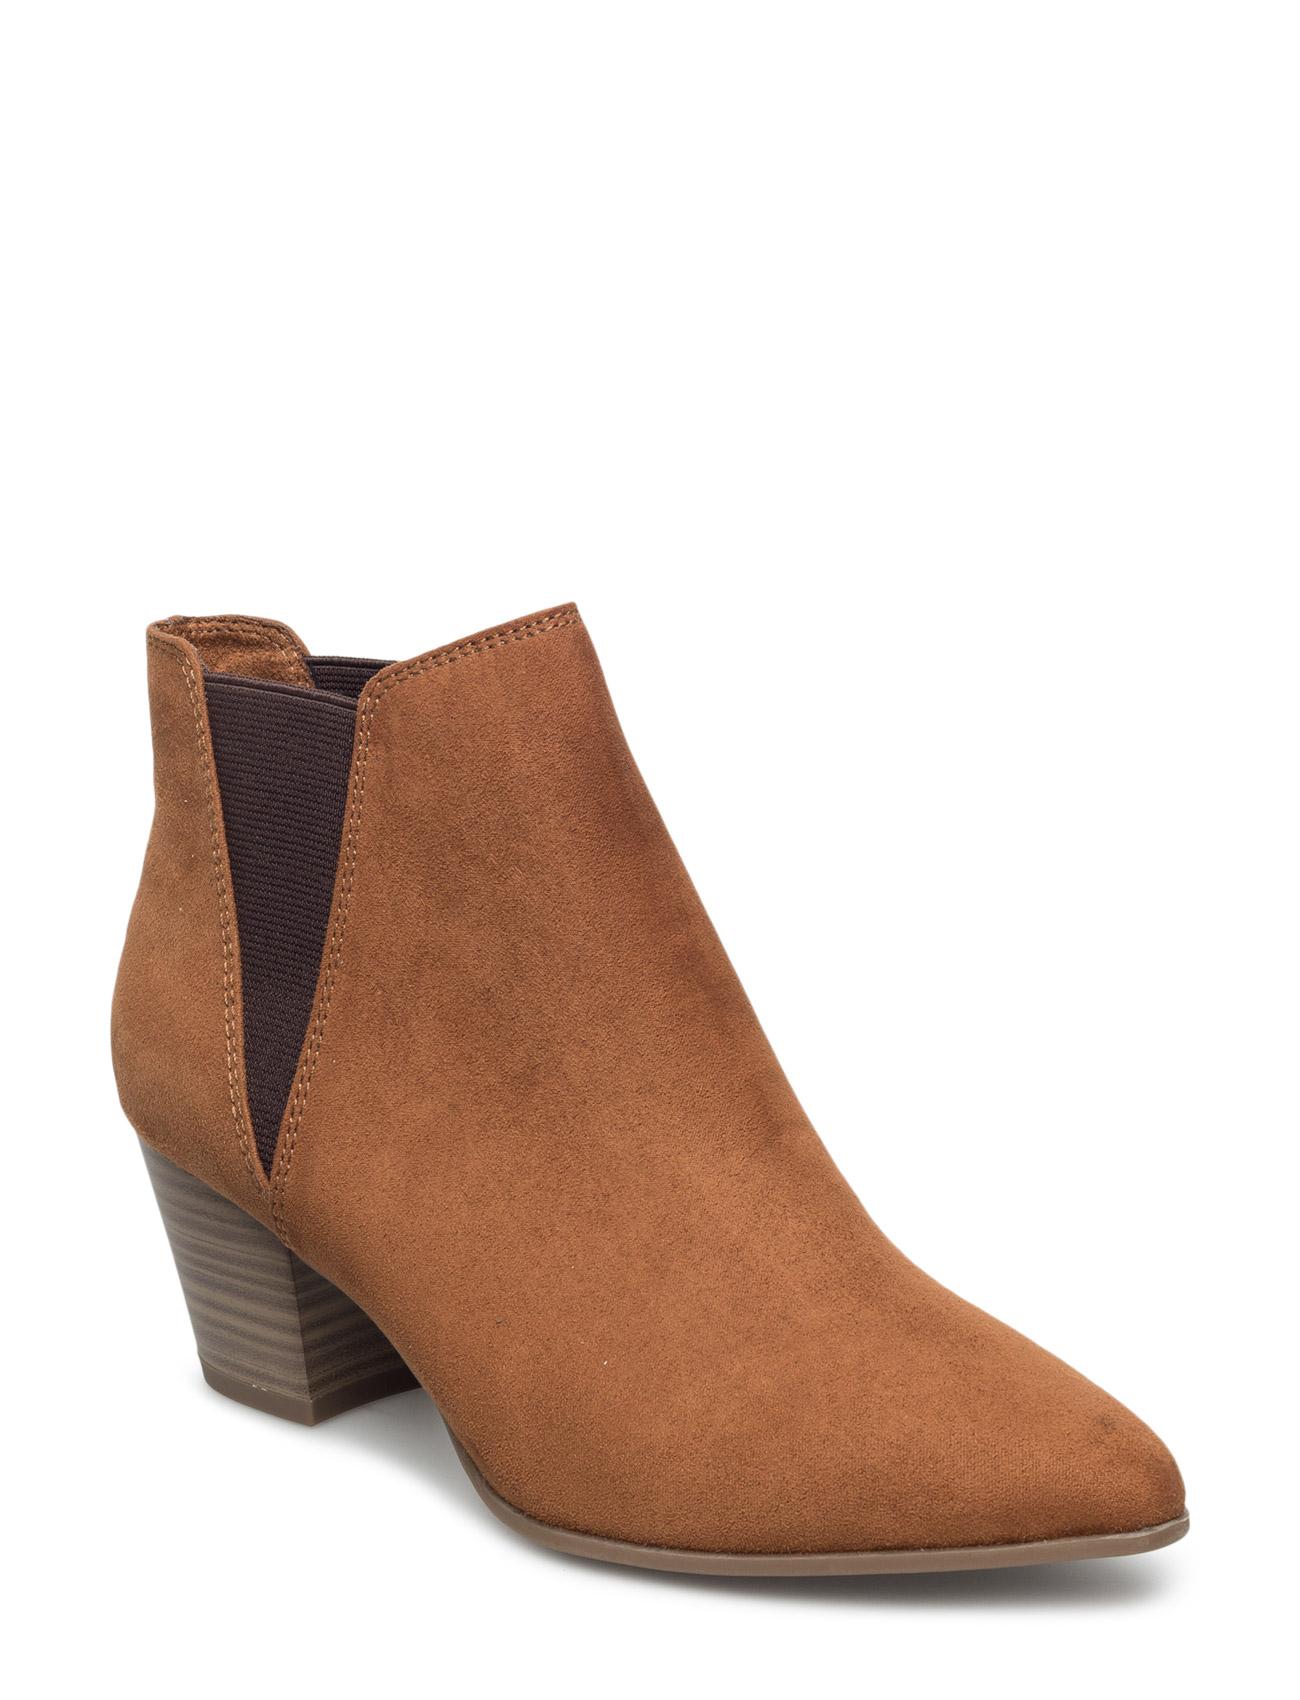 Woms Boots - Carya